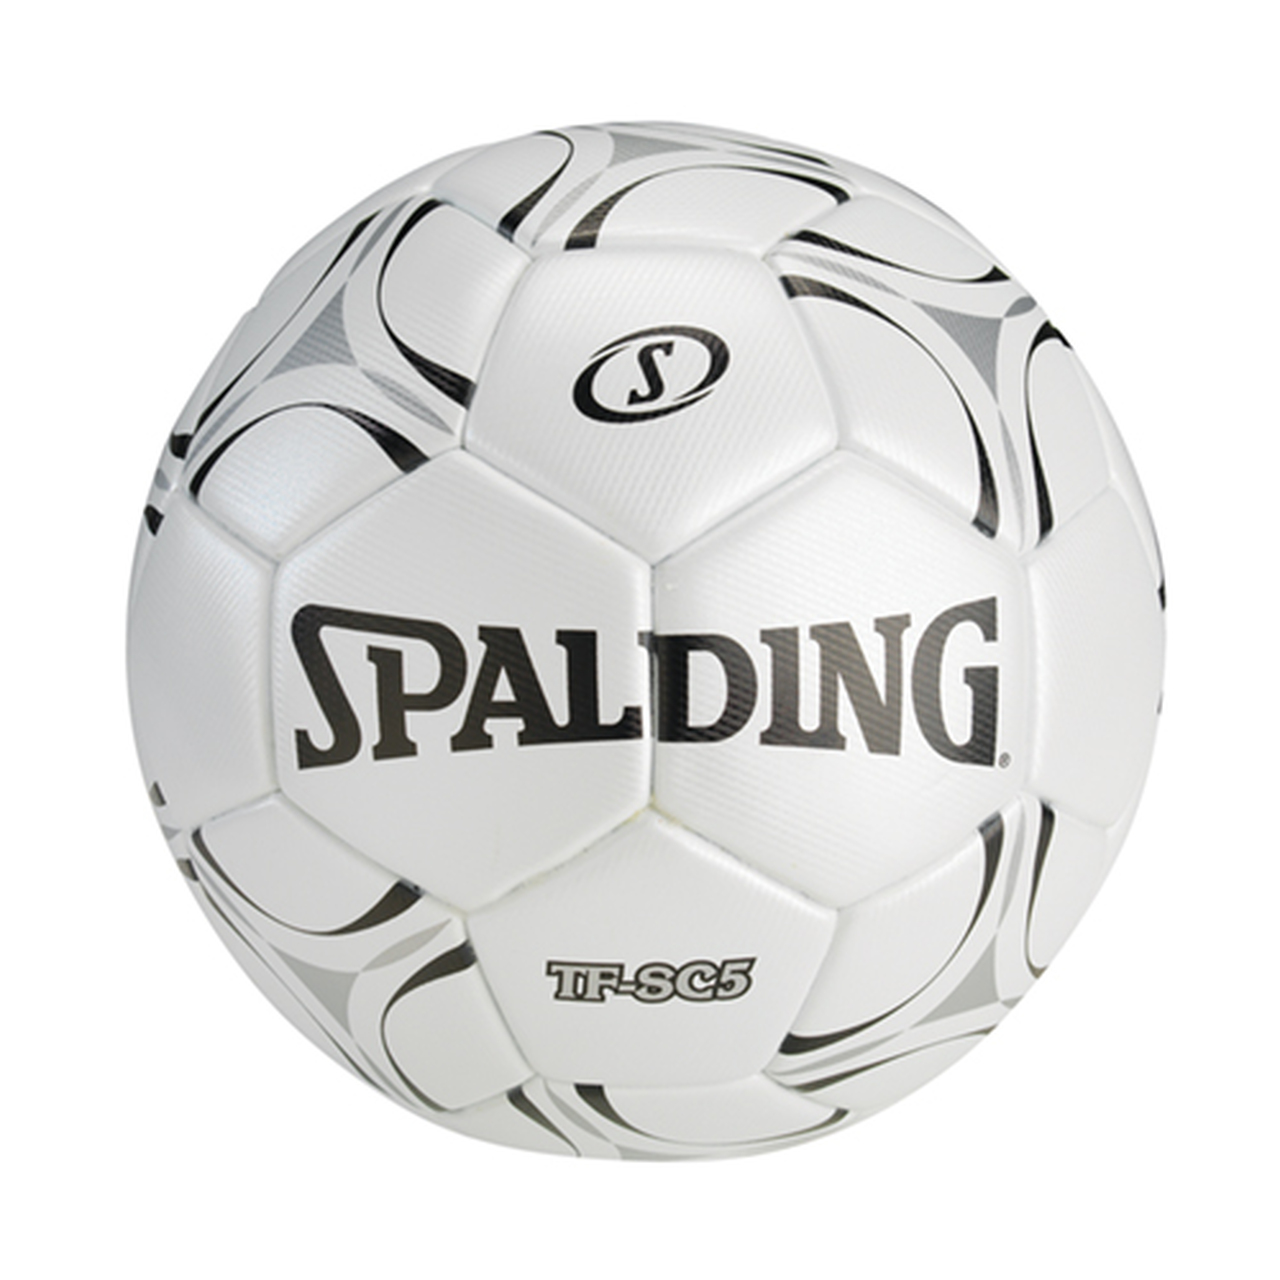 Spalding TF-SC5 Soccer Ball White/Black Sz 5